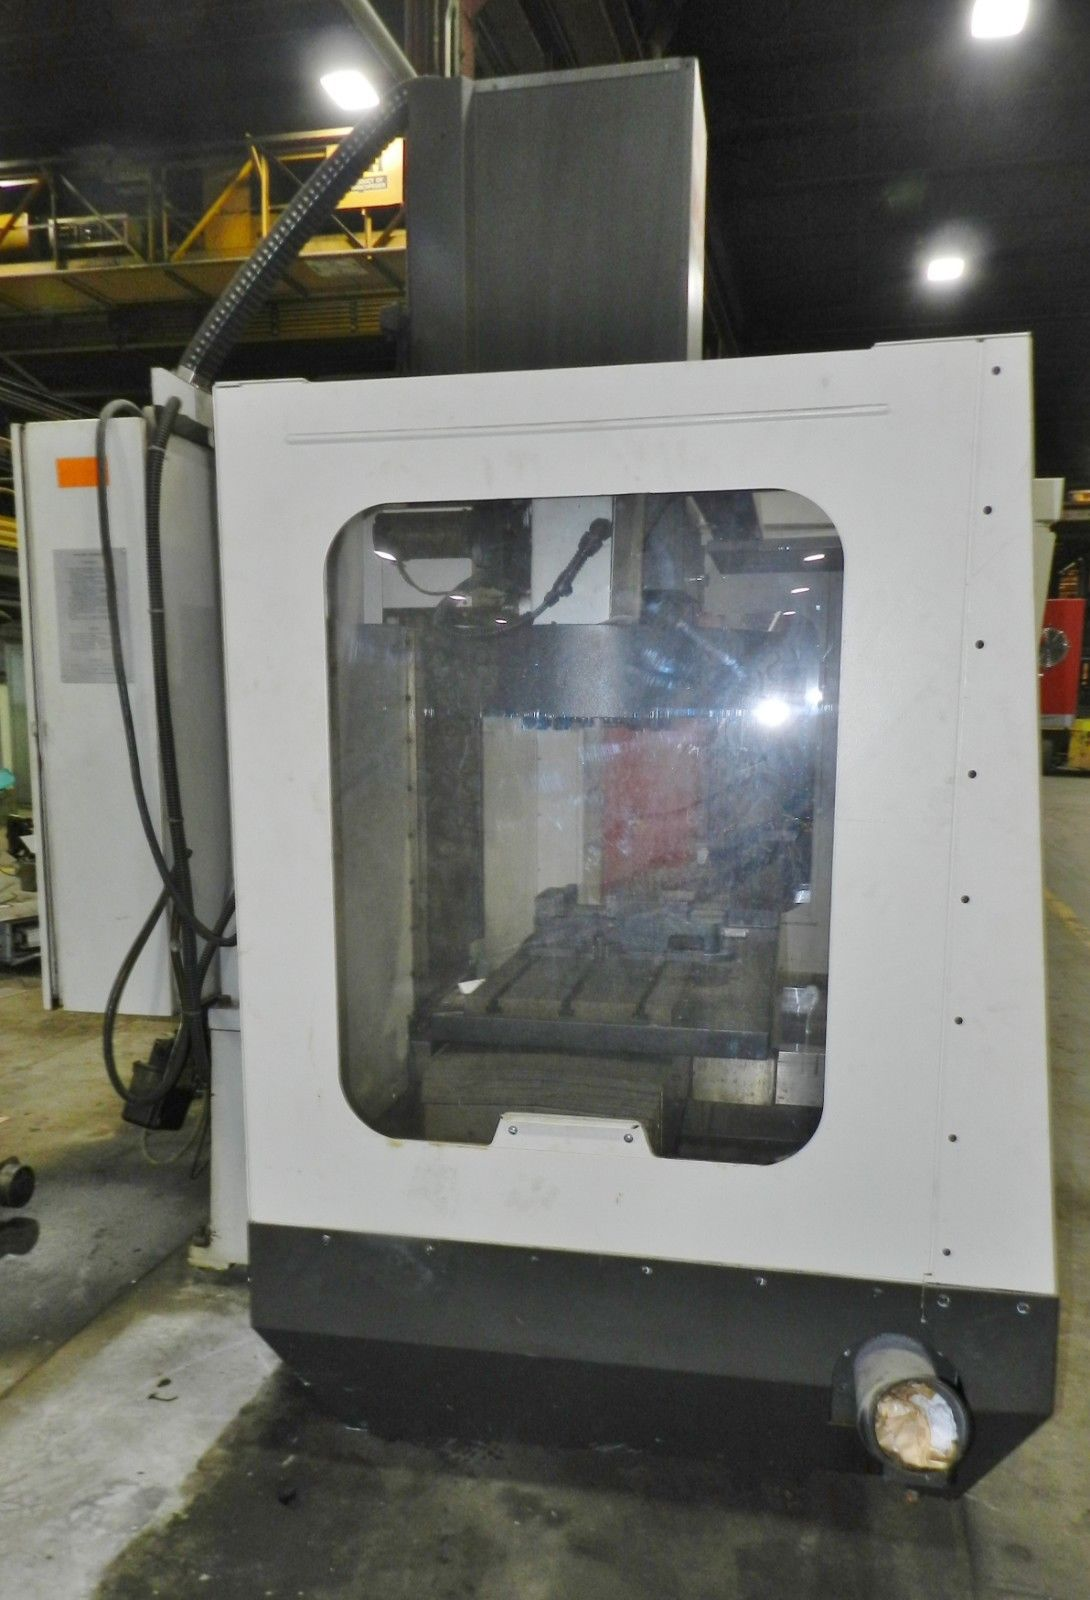 Lot 9 - HAAS VF2 CNC Vertical Machining Center